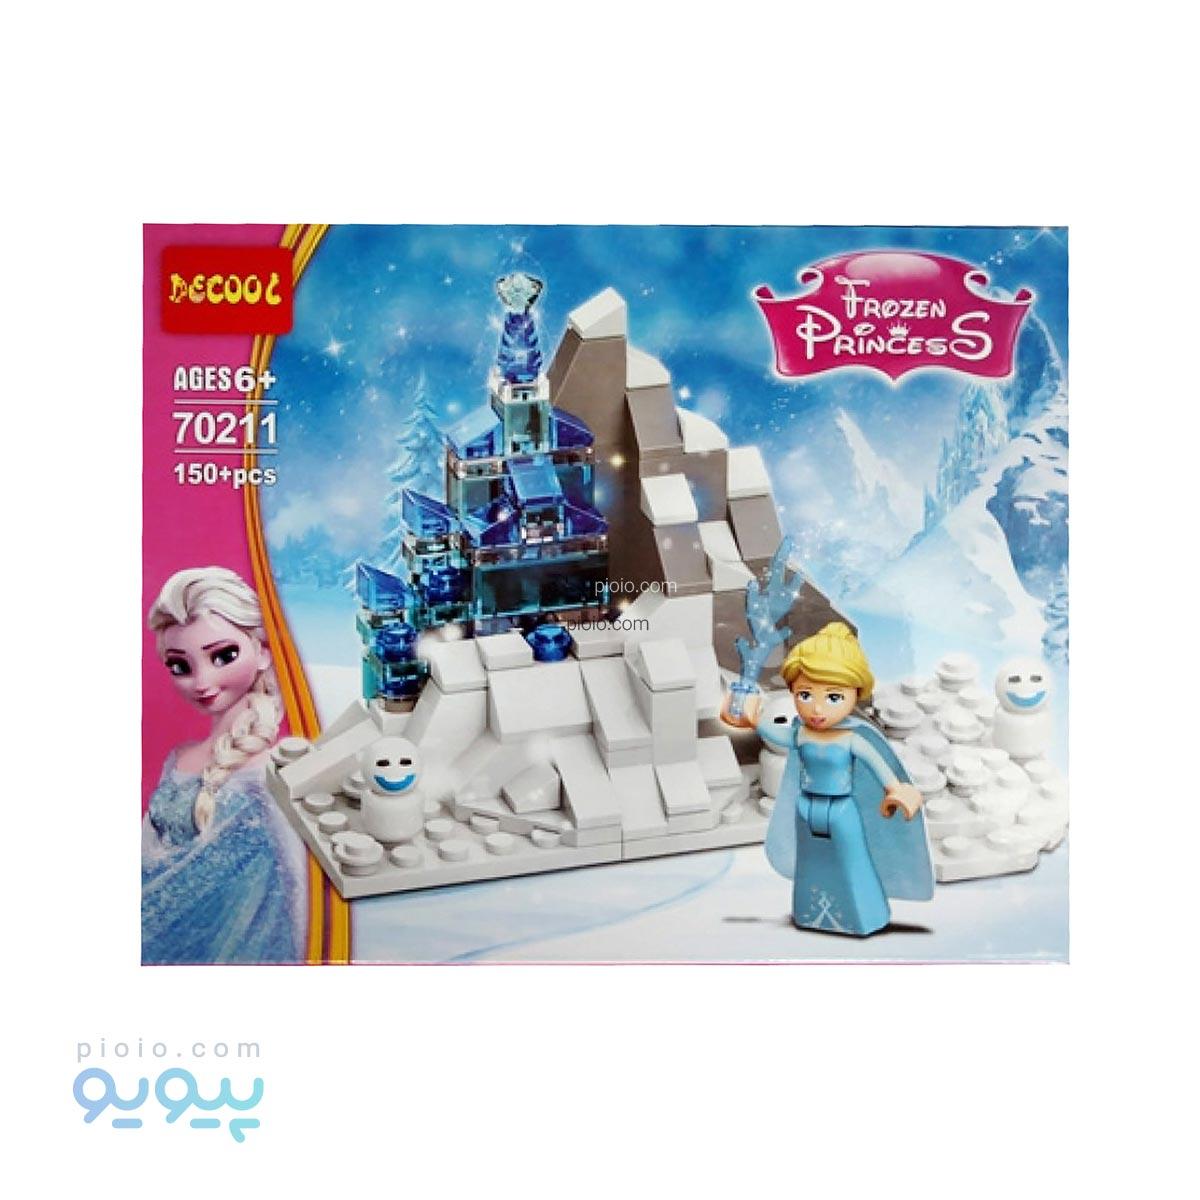 Planet_x_disney_princess_frozen_ice_castle_blocks_px-9747